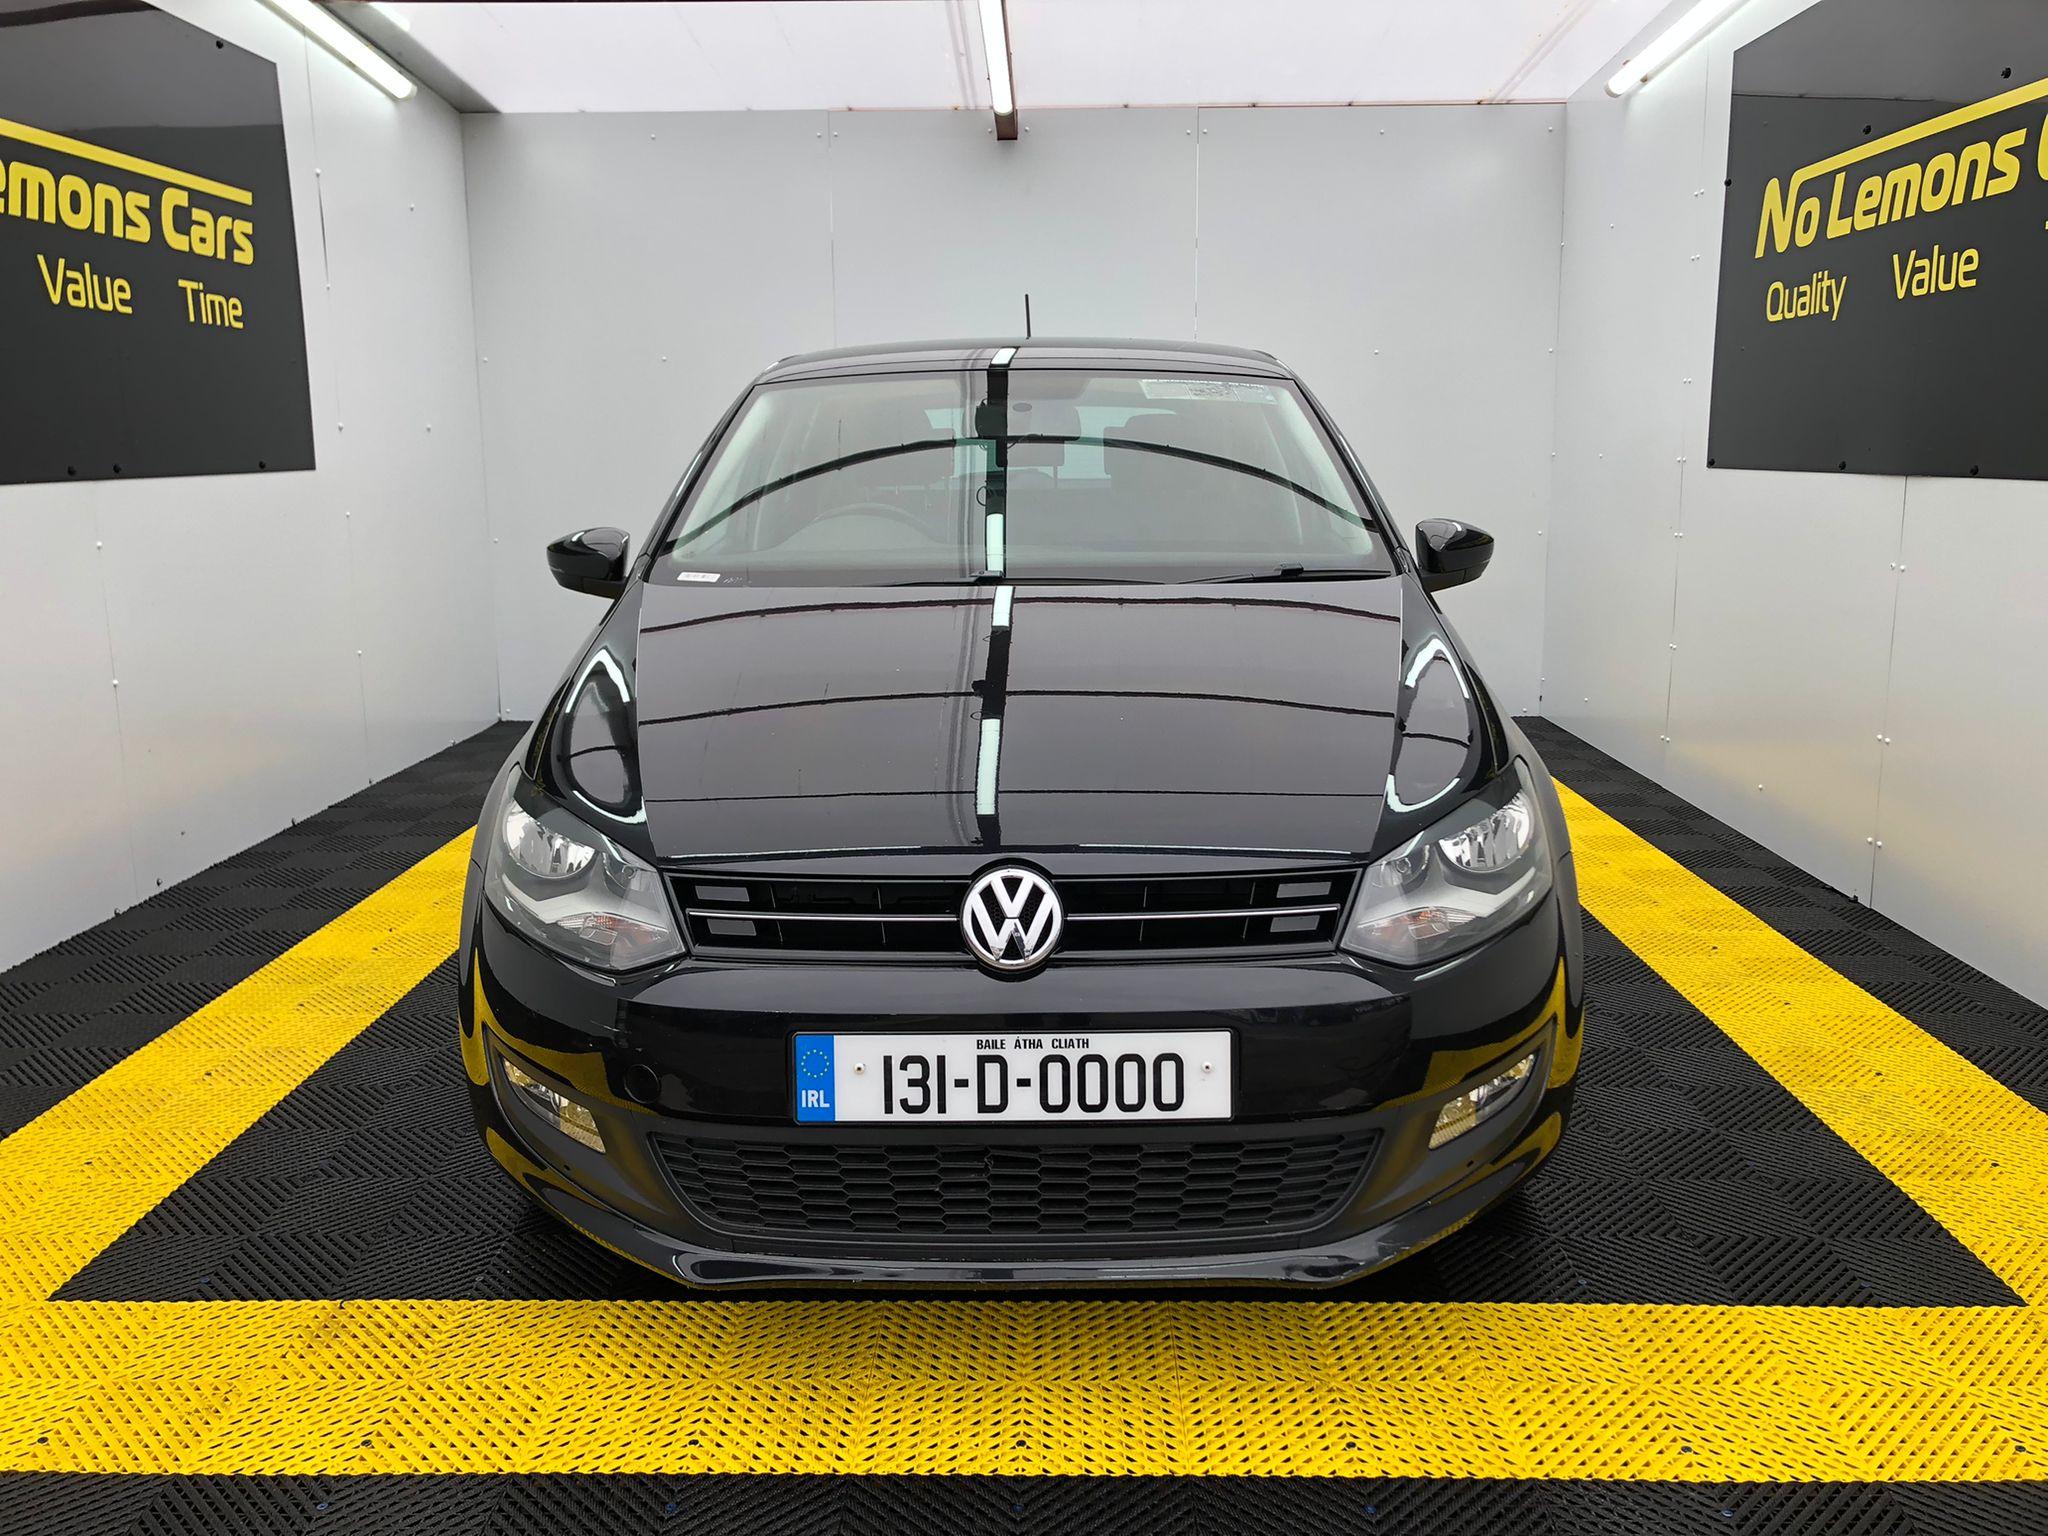 Volkswagen Polo 2013 1.2 Petrol